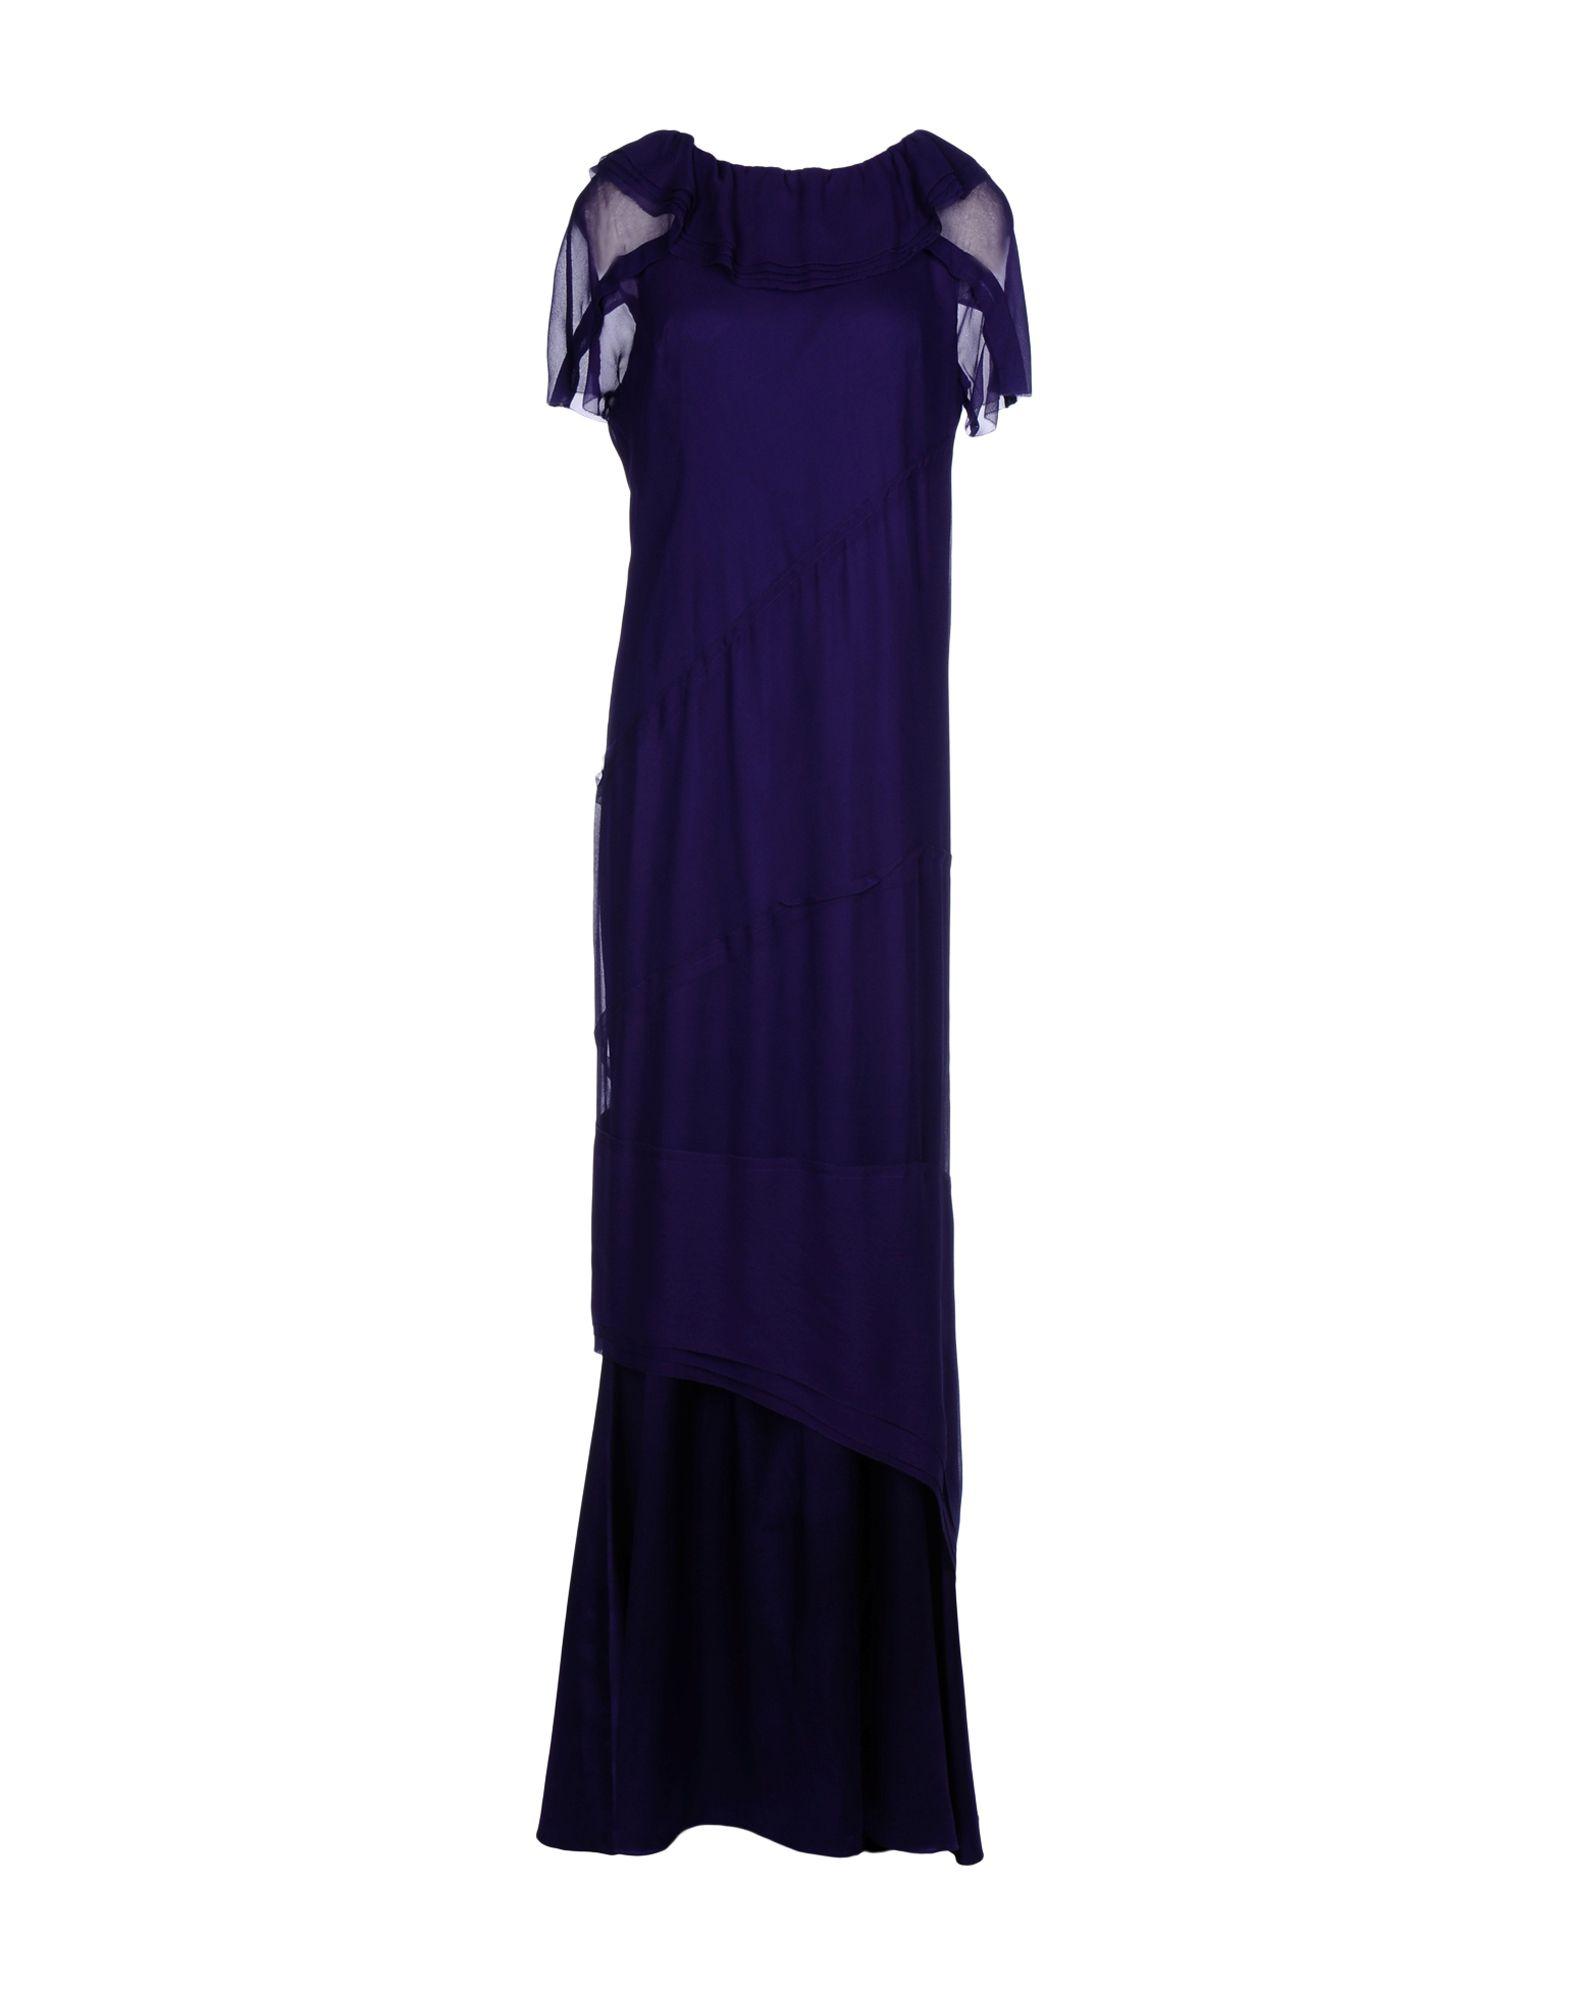 Robe longue vera wang femme. violet foncé. 44...